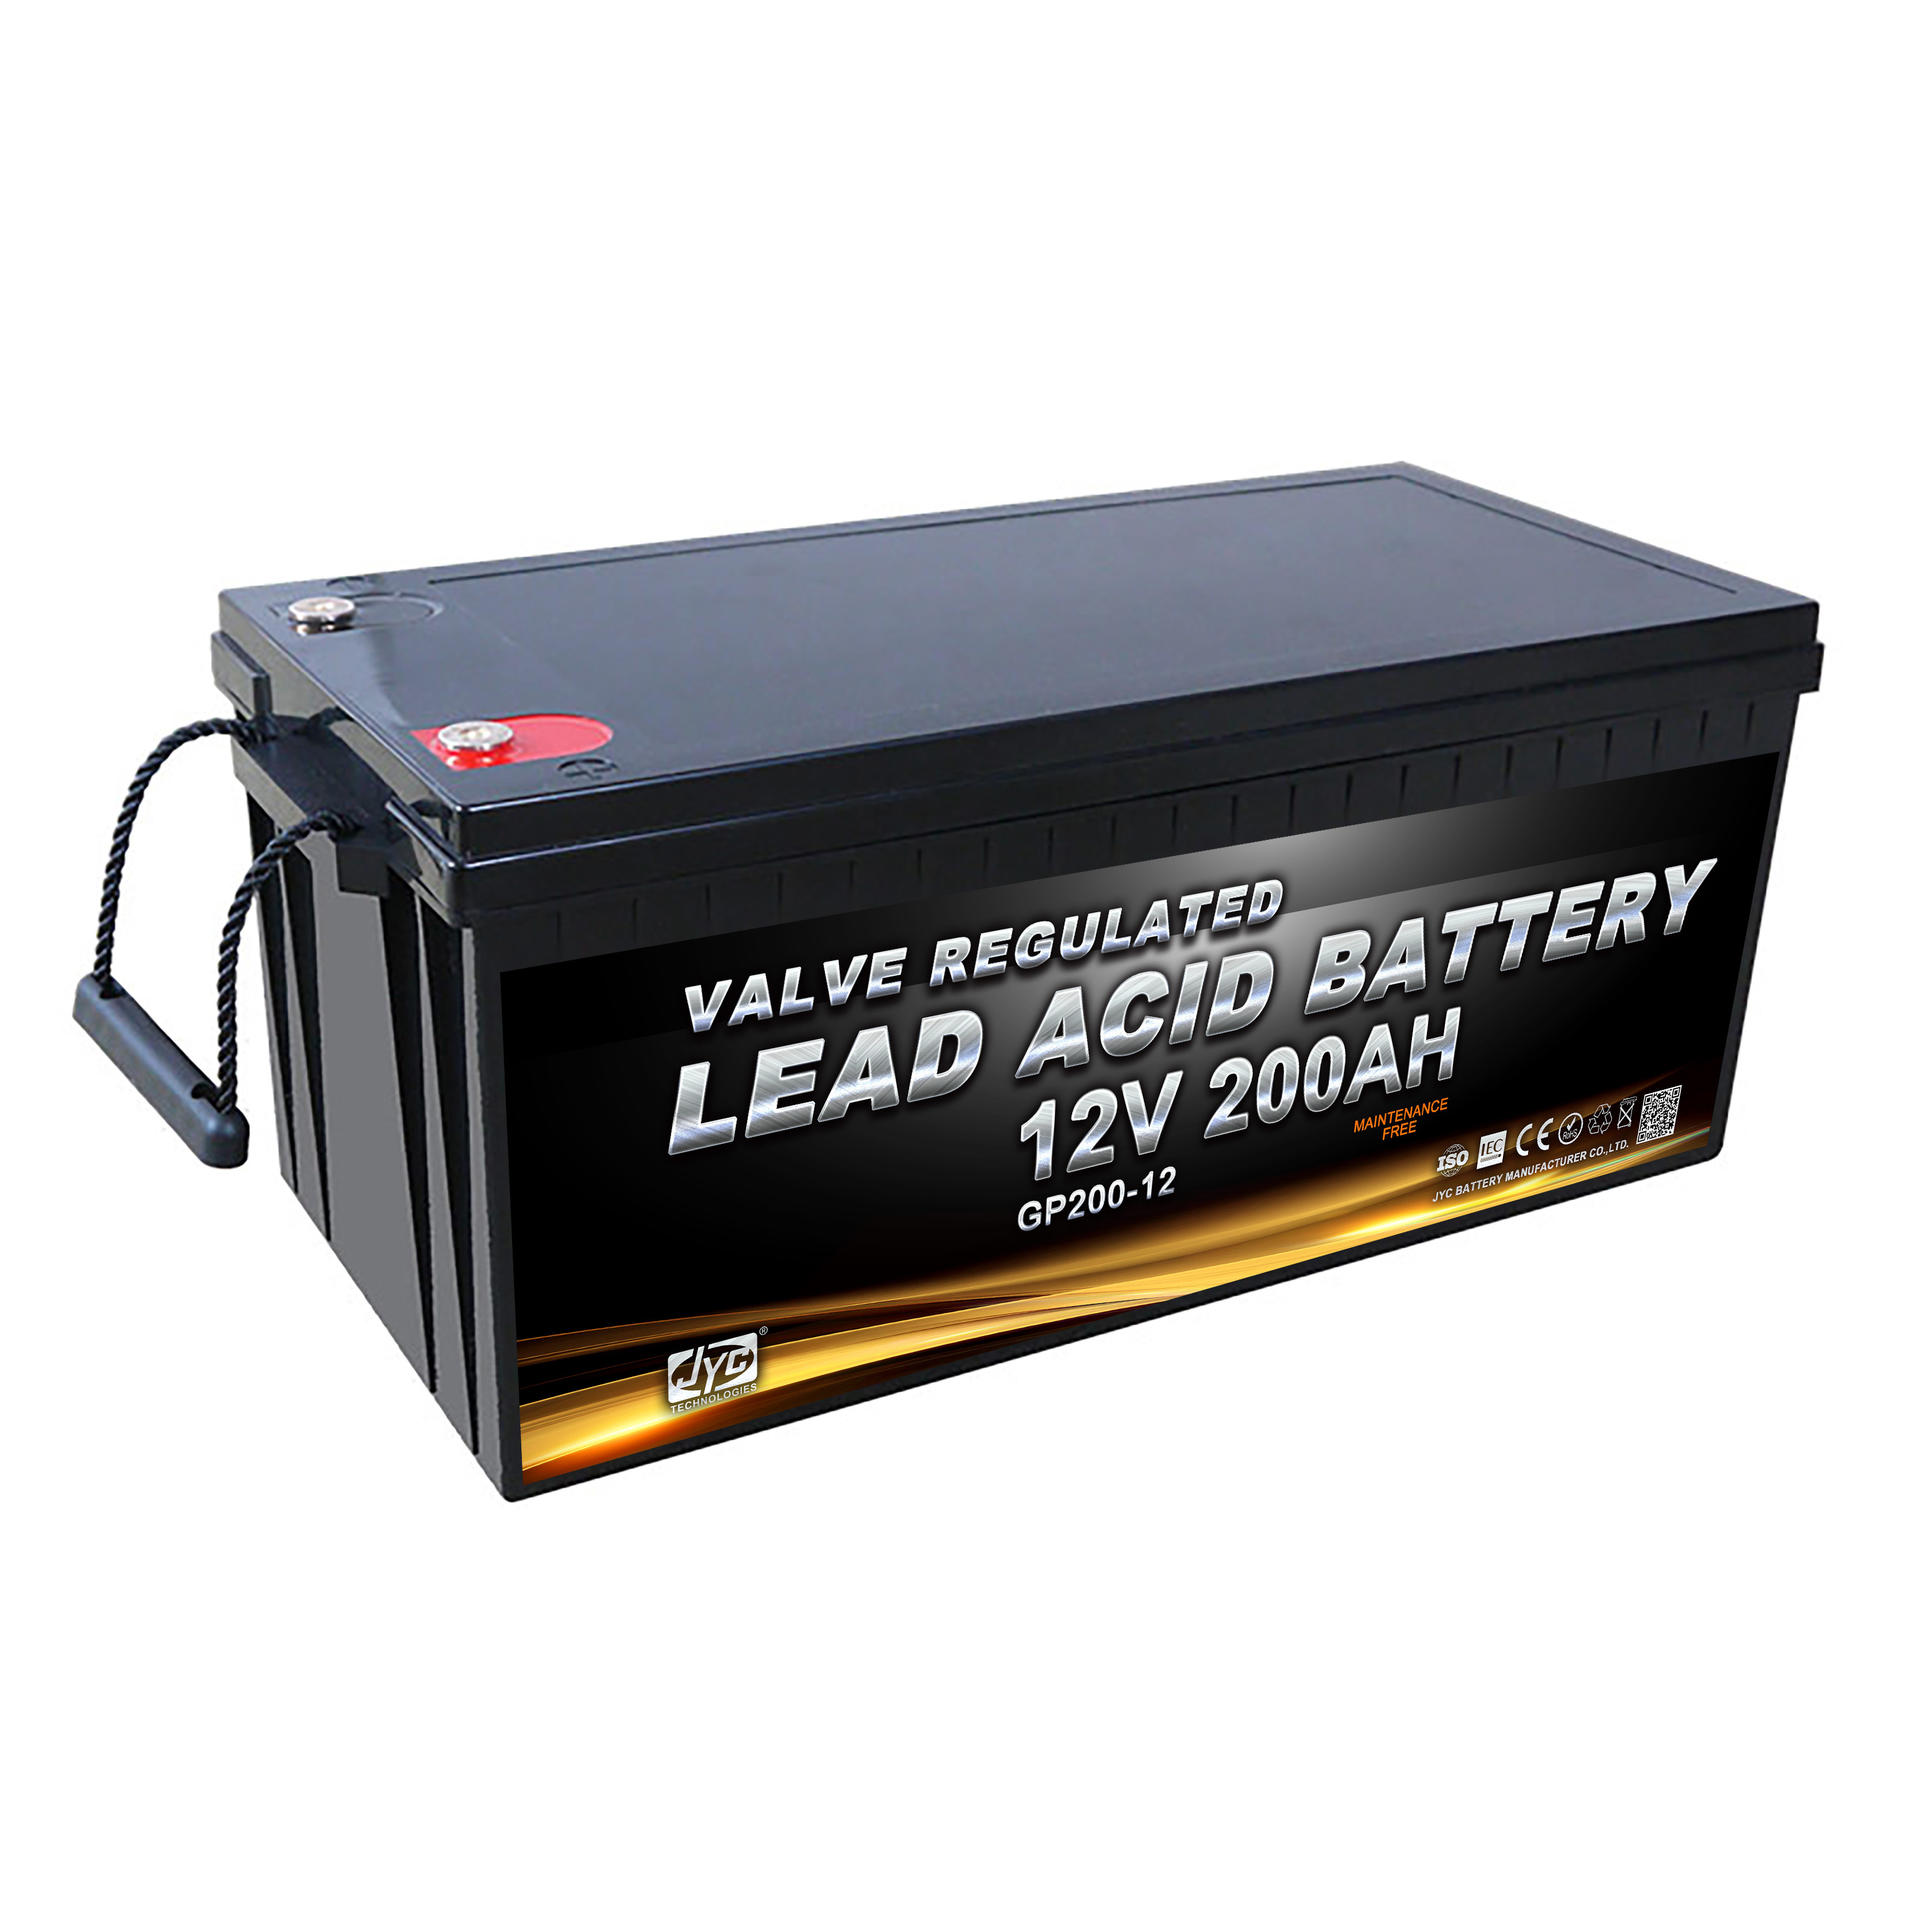 Solar Gel Battery 12v 200ah Deep Cycle Lead Acid Battery for UPS/Solar/Wind/Telecom/Backup